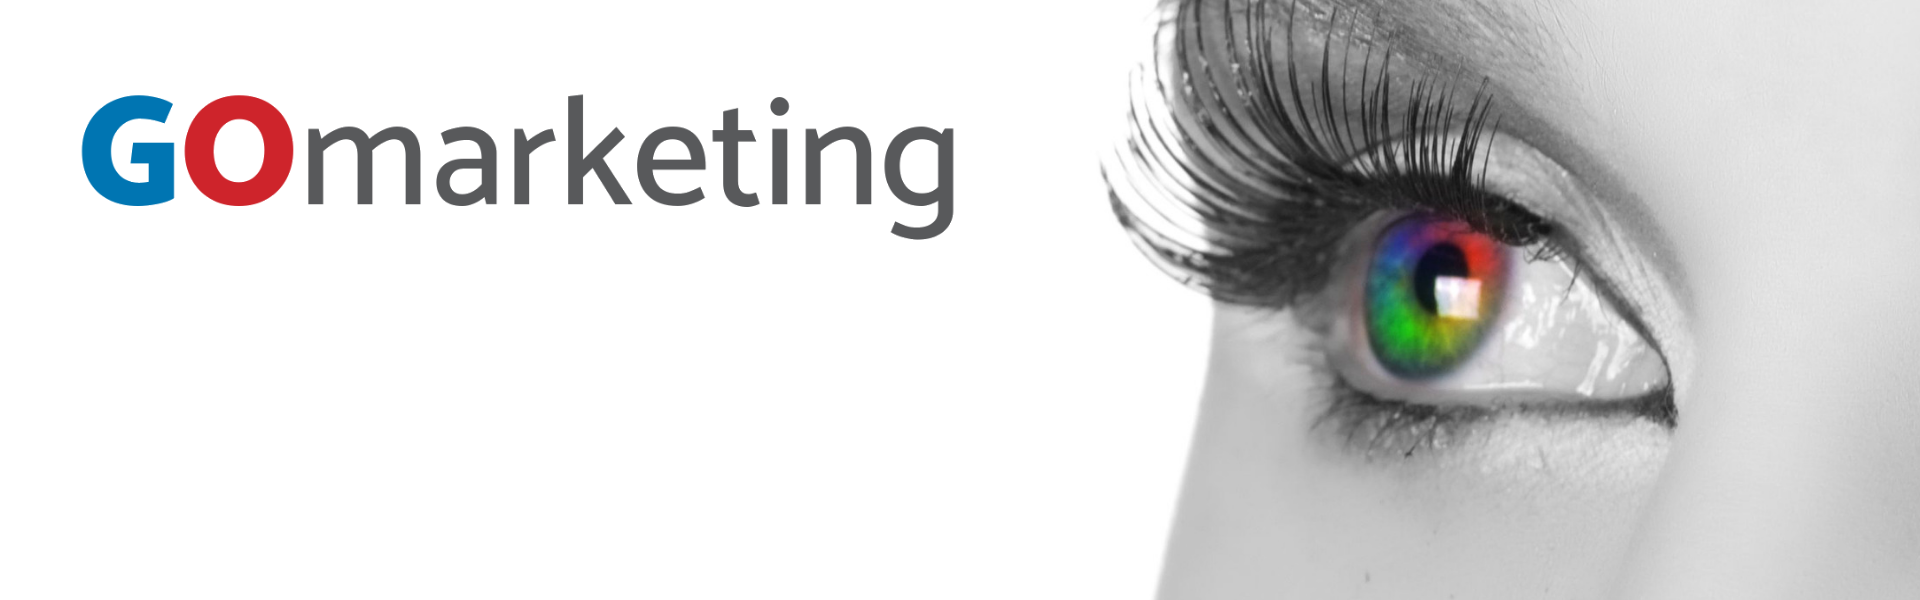 Social Media Marketing - Contact Social Media